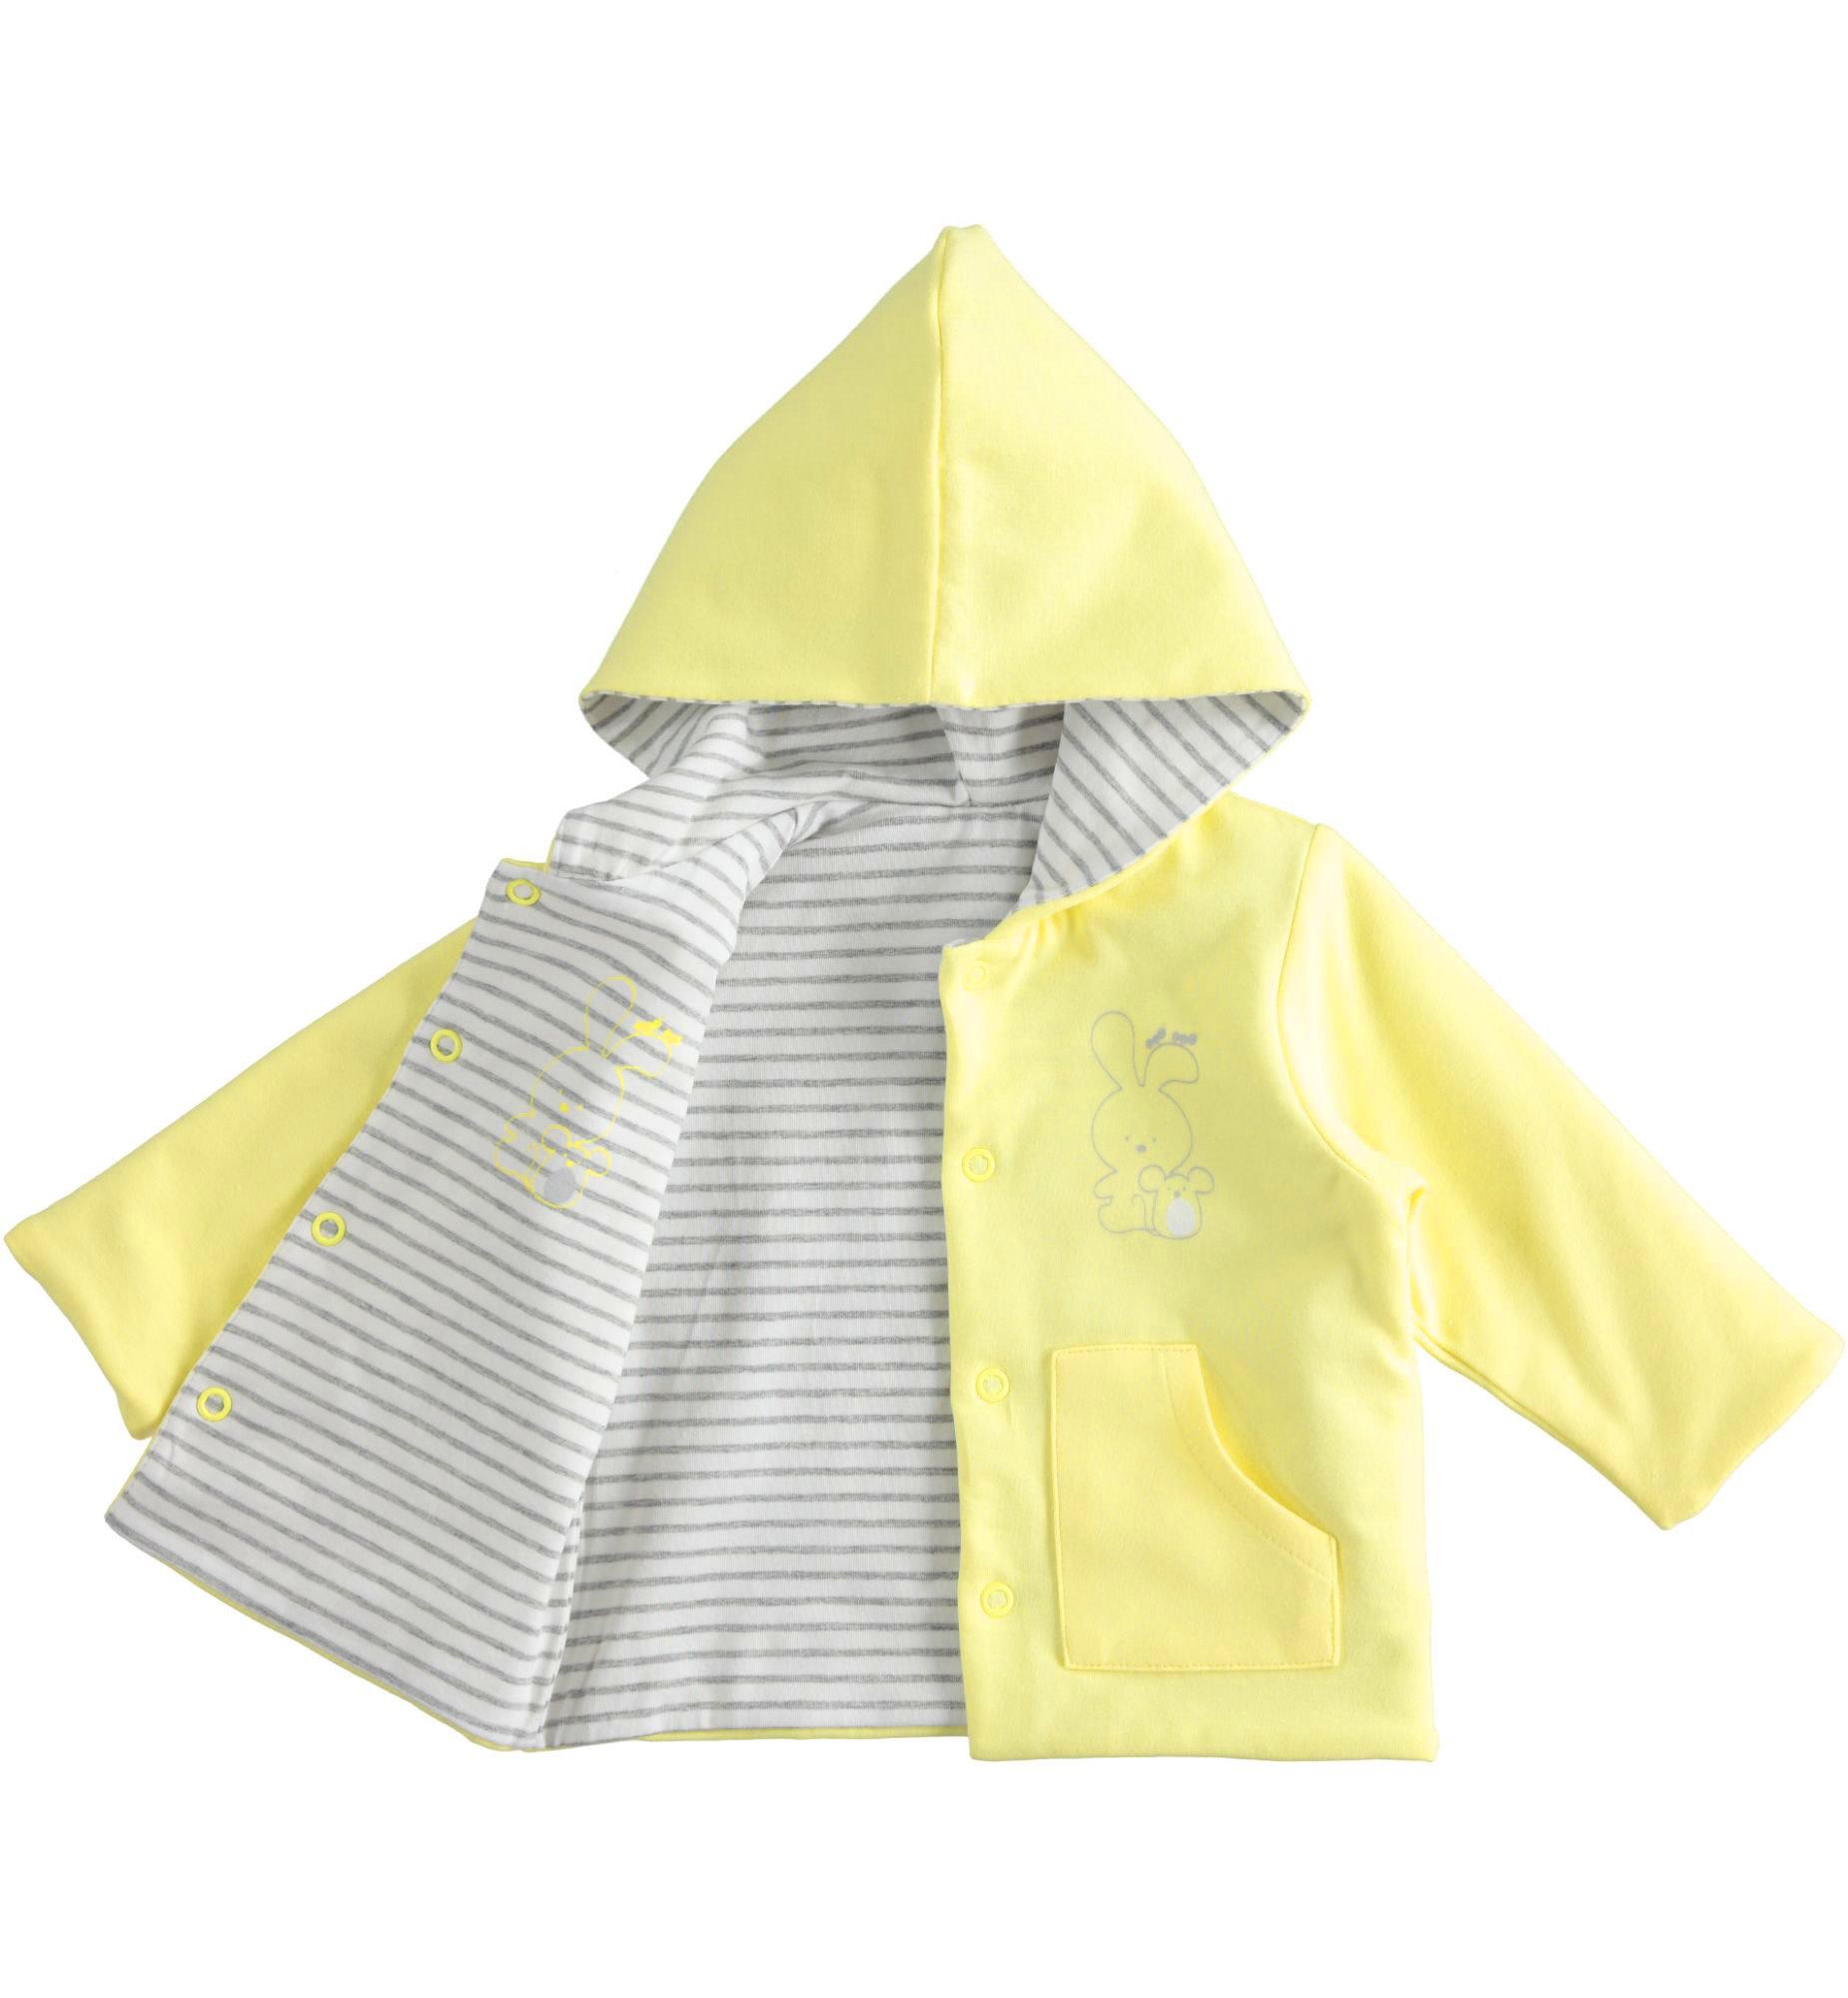 Ido Ido Soft Lemon Knit Jacket With Bunny & Mouse